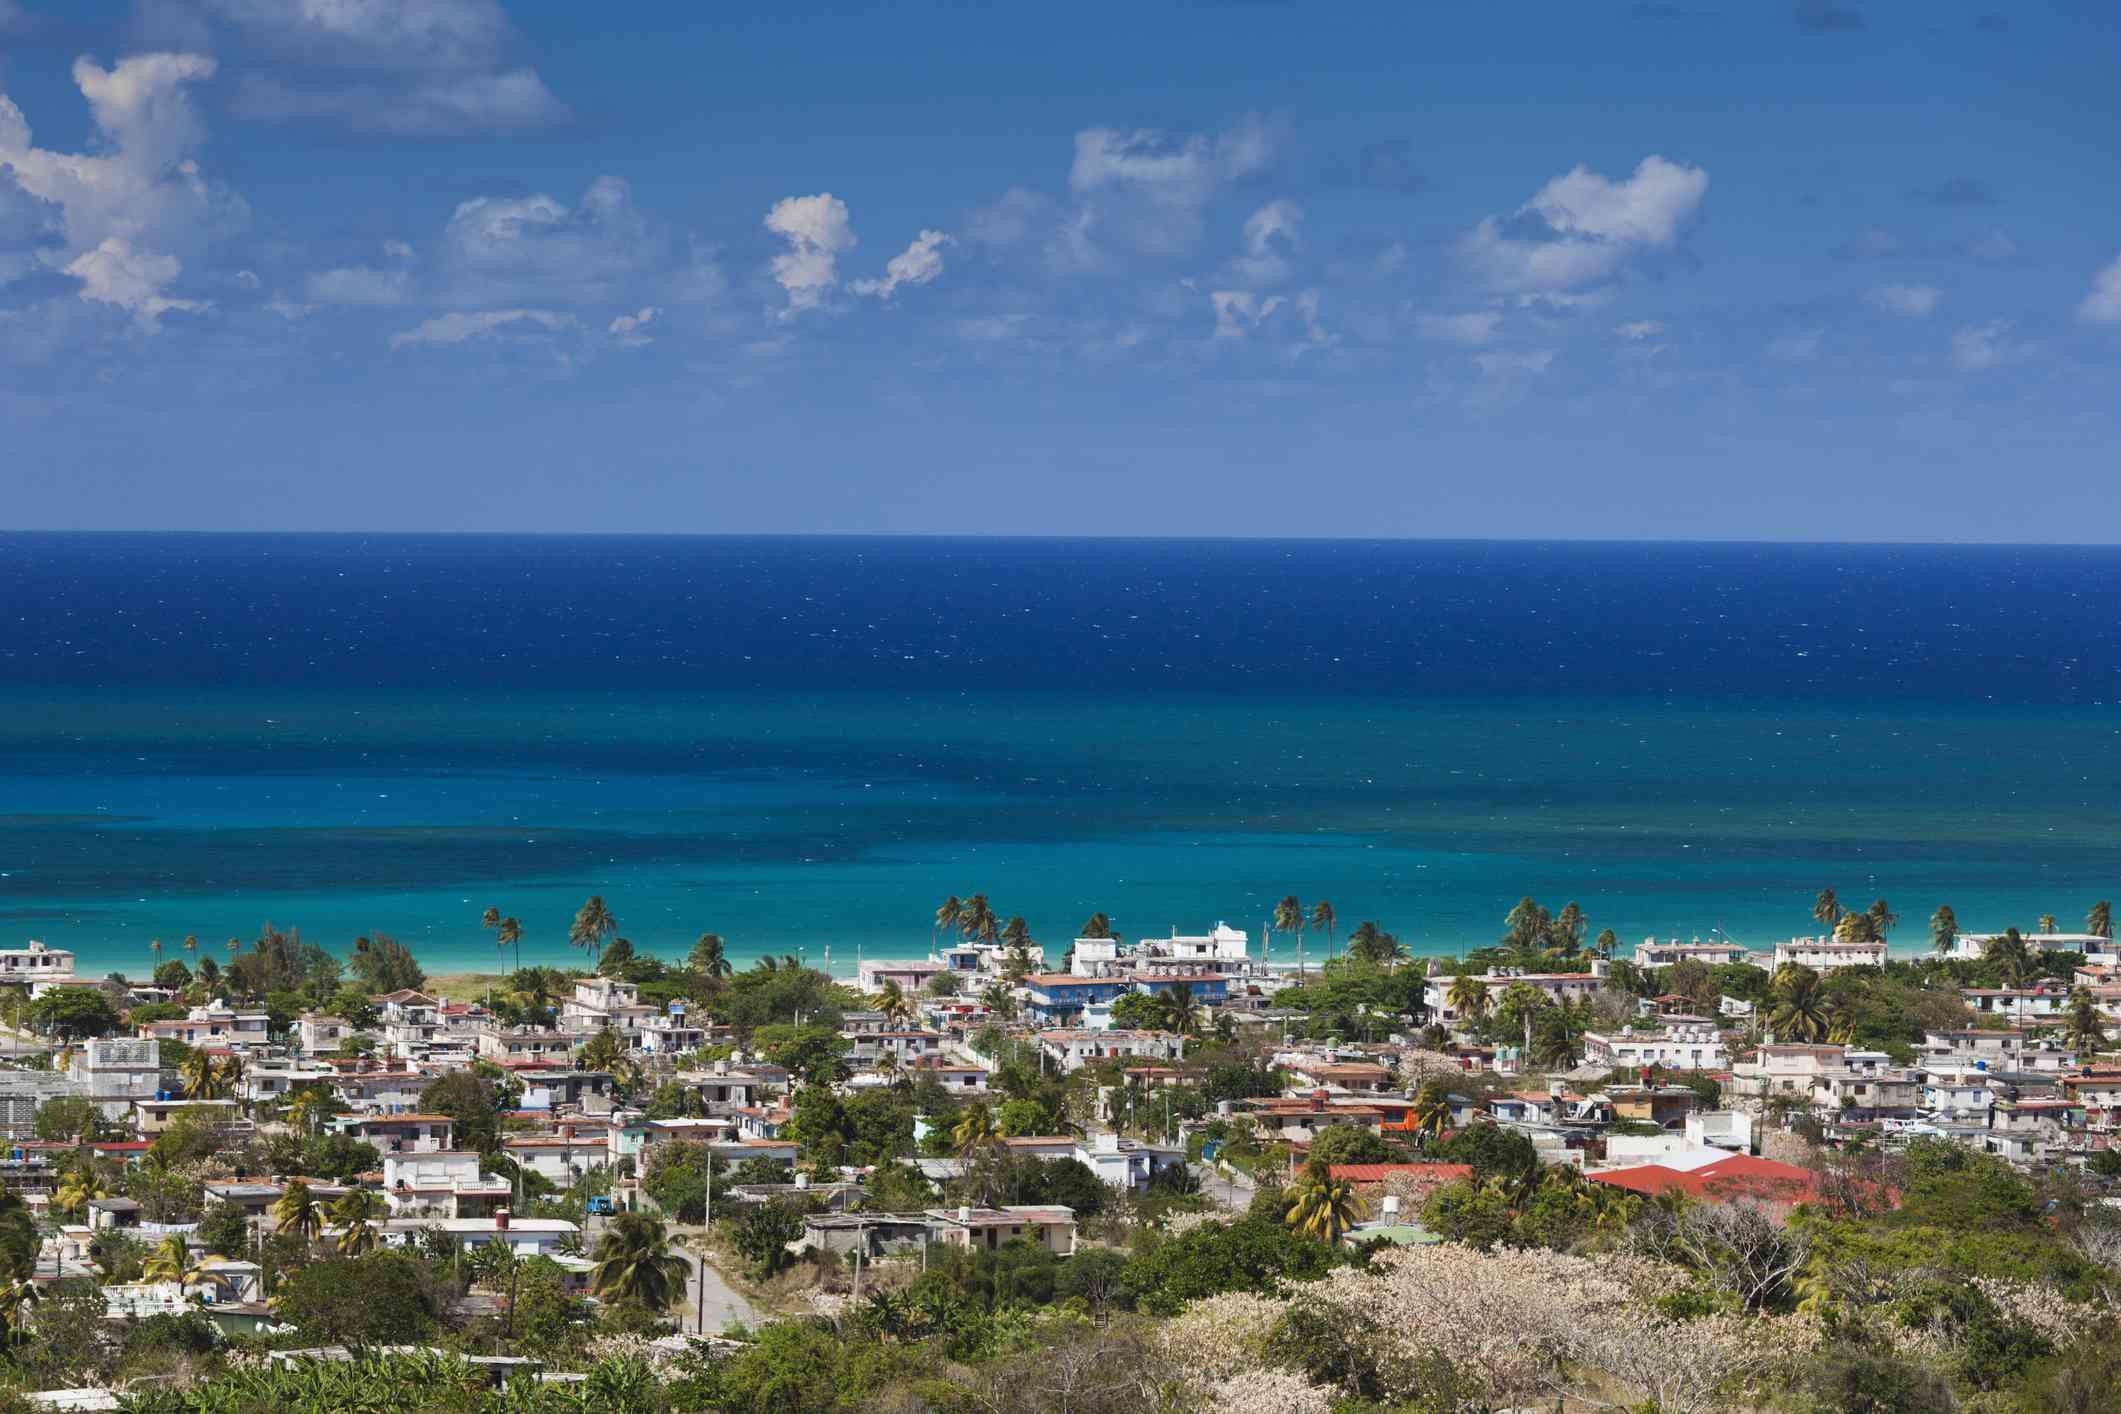 Cuba, Havana Province, Playas del Este beaches